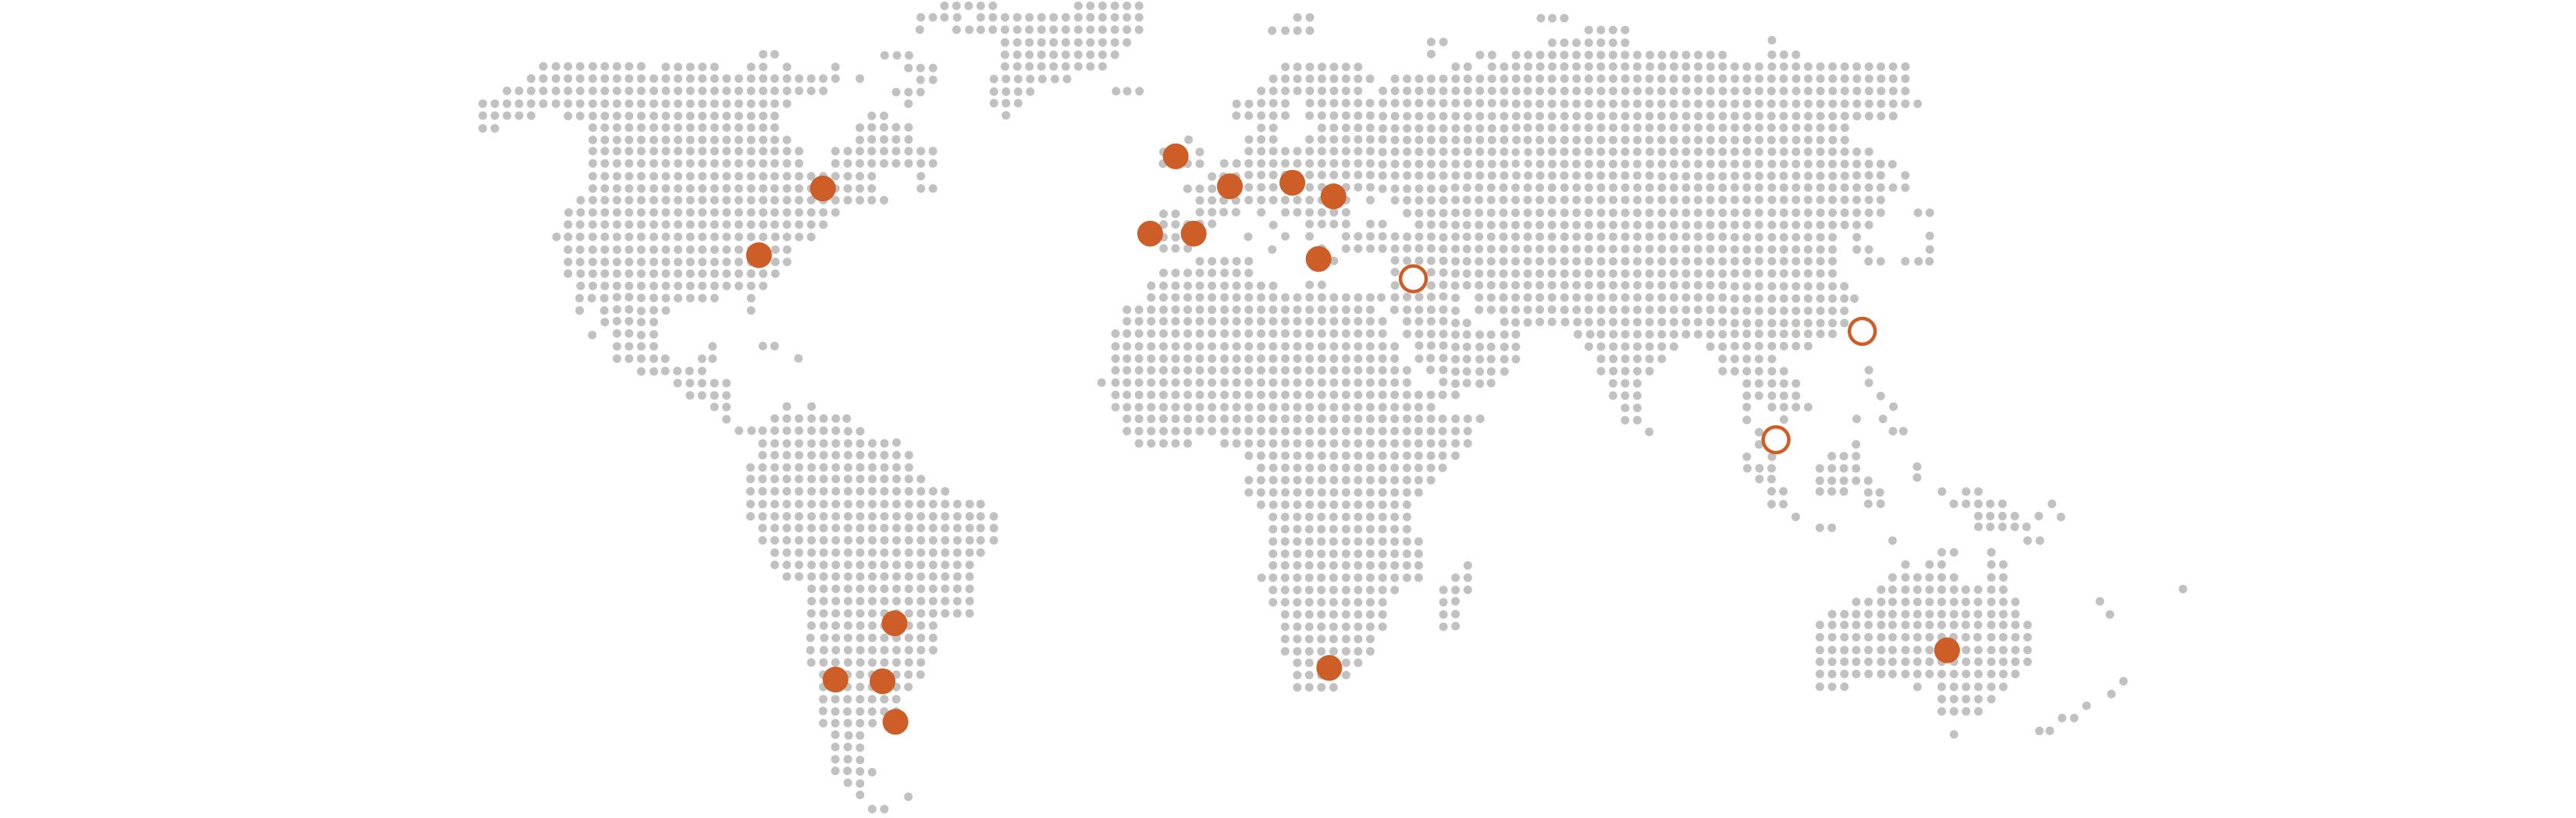 map-landen3300png-20170930